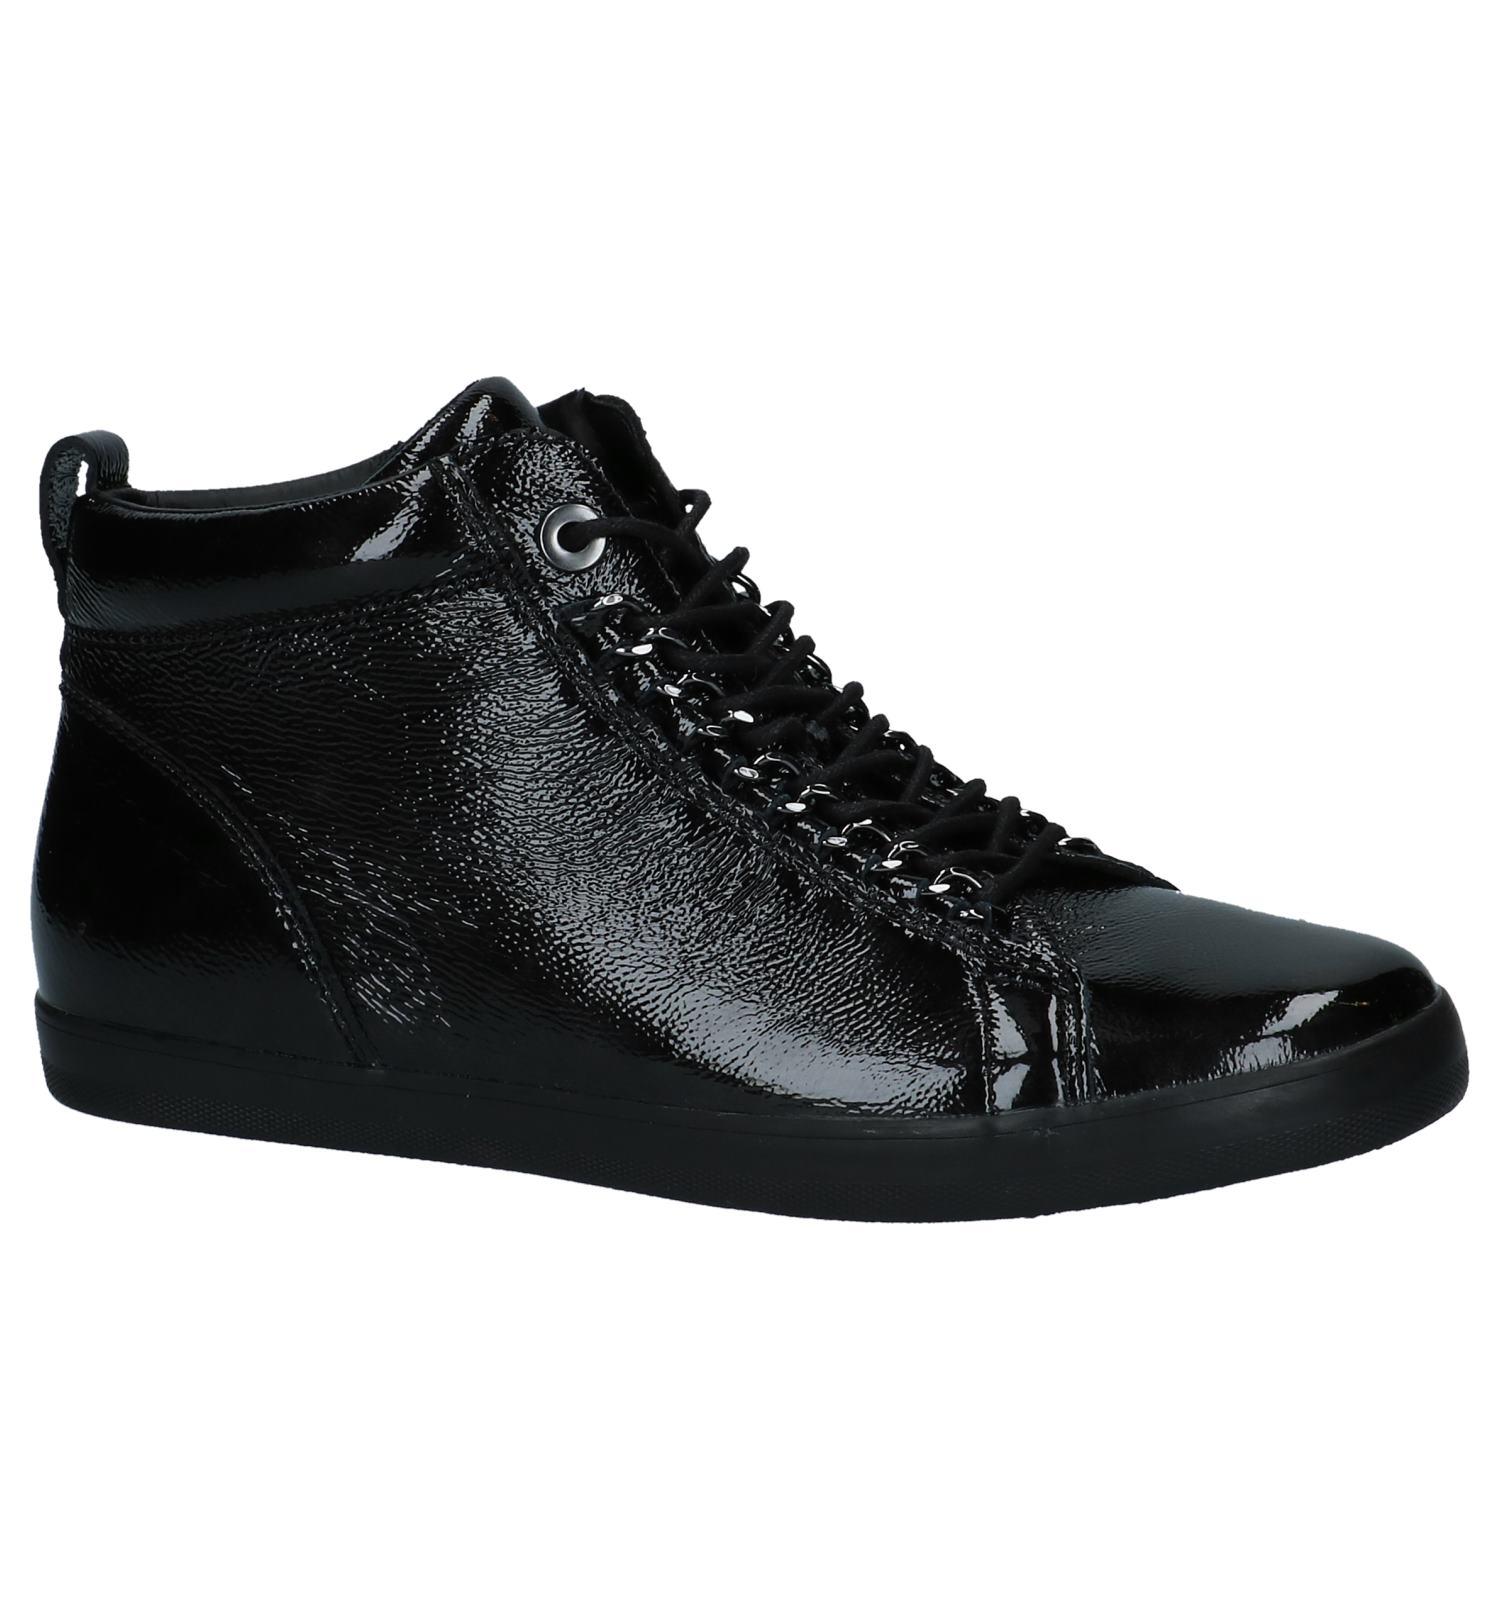 c7d479c8a43 Zwarte Hoge Sneakers Gabor Optifit | TORFS.BE | Gratis verzend en retour